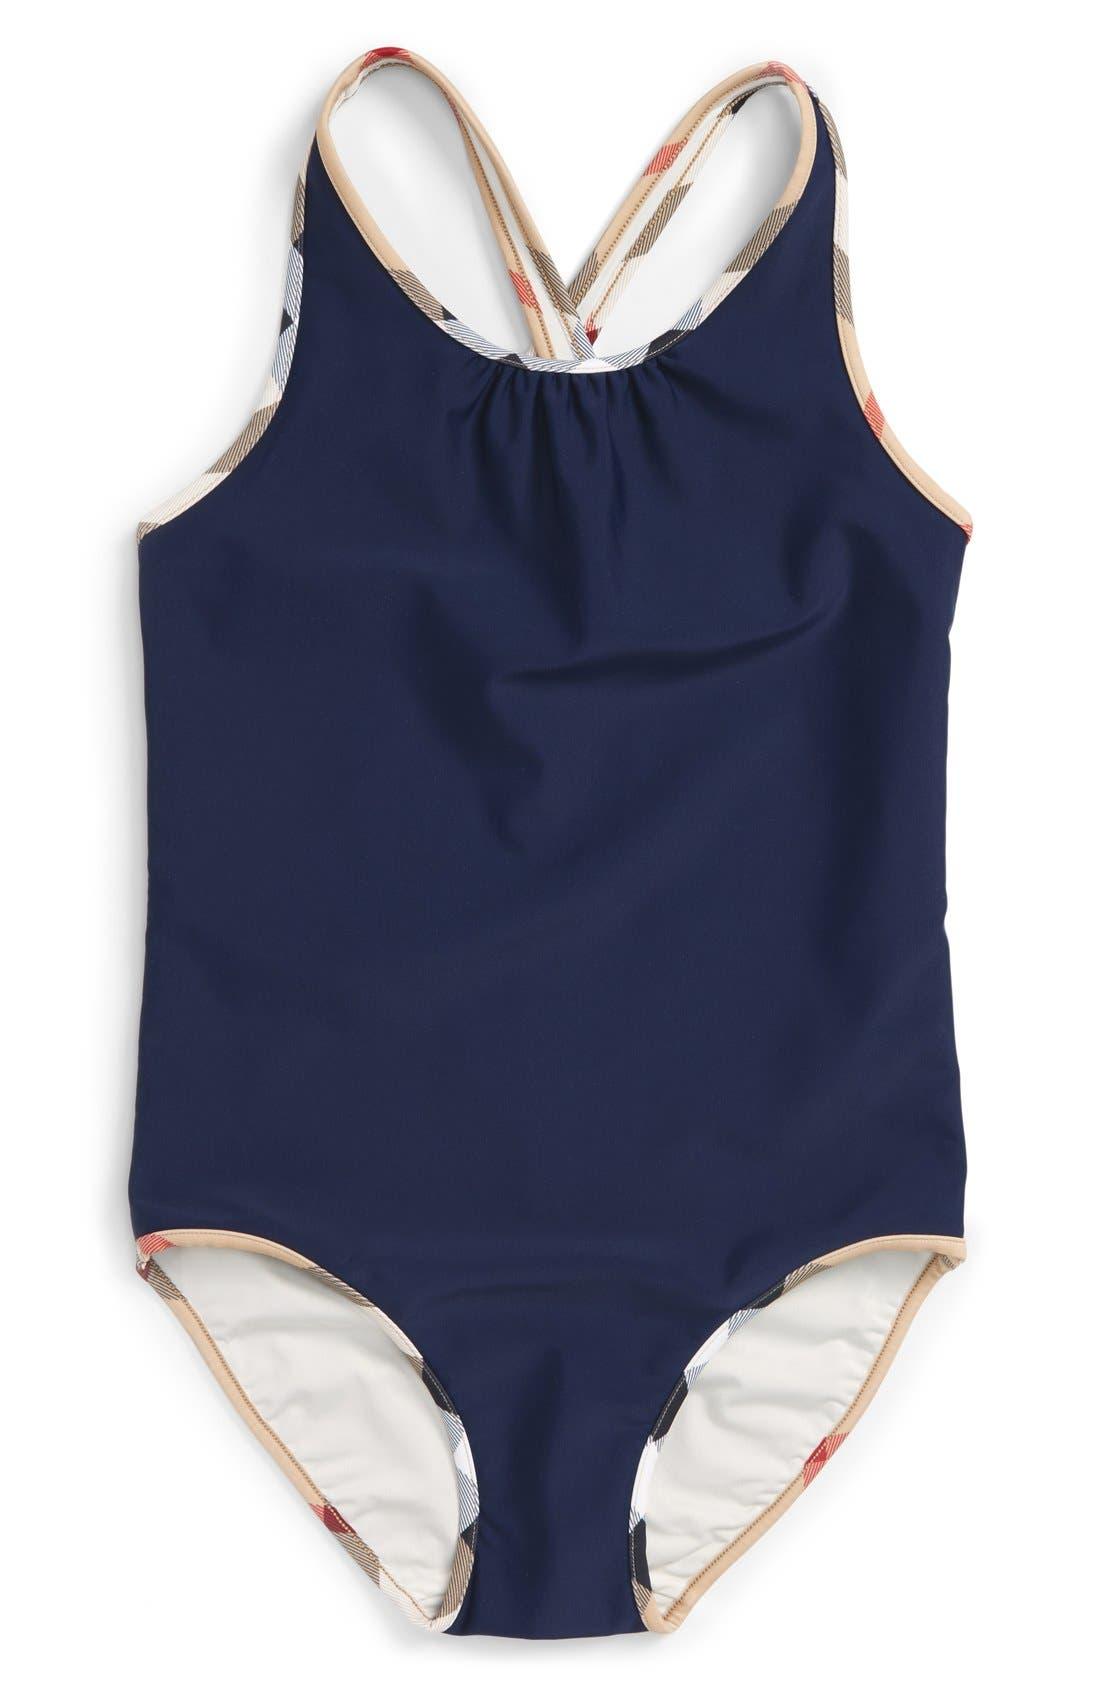 Main Image - Burberry 'Beadnell' One-Piece Swimsuit (Little Girls & Big Girls)